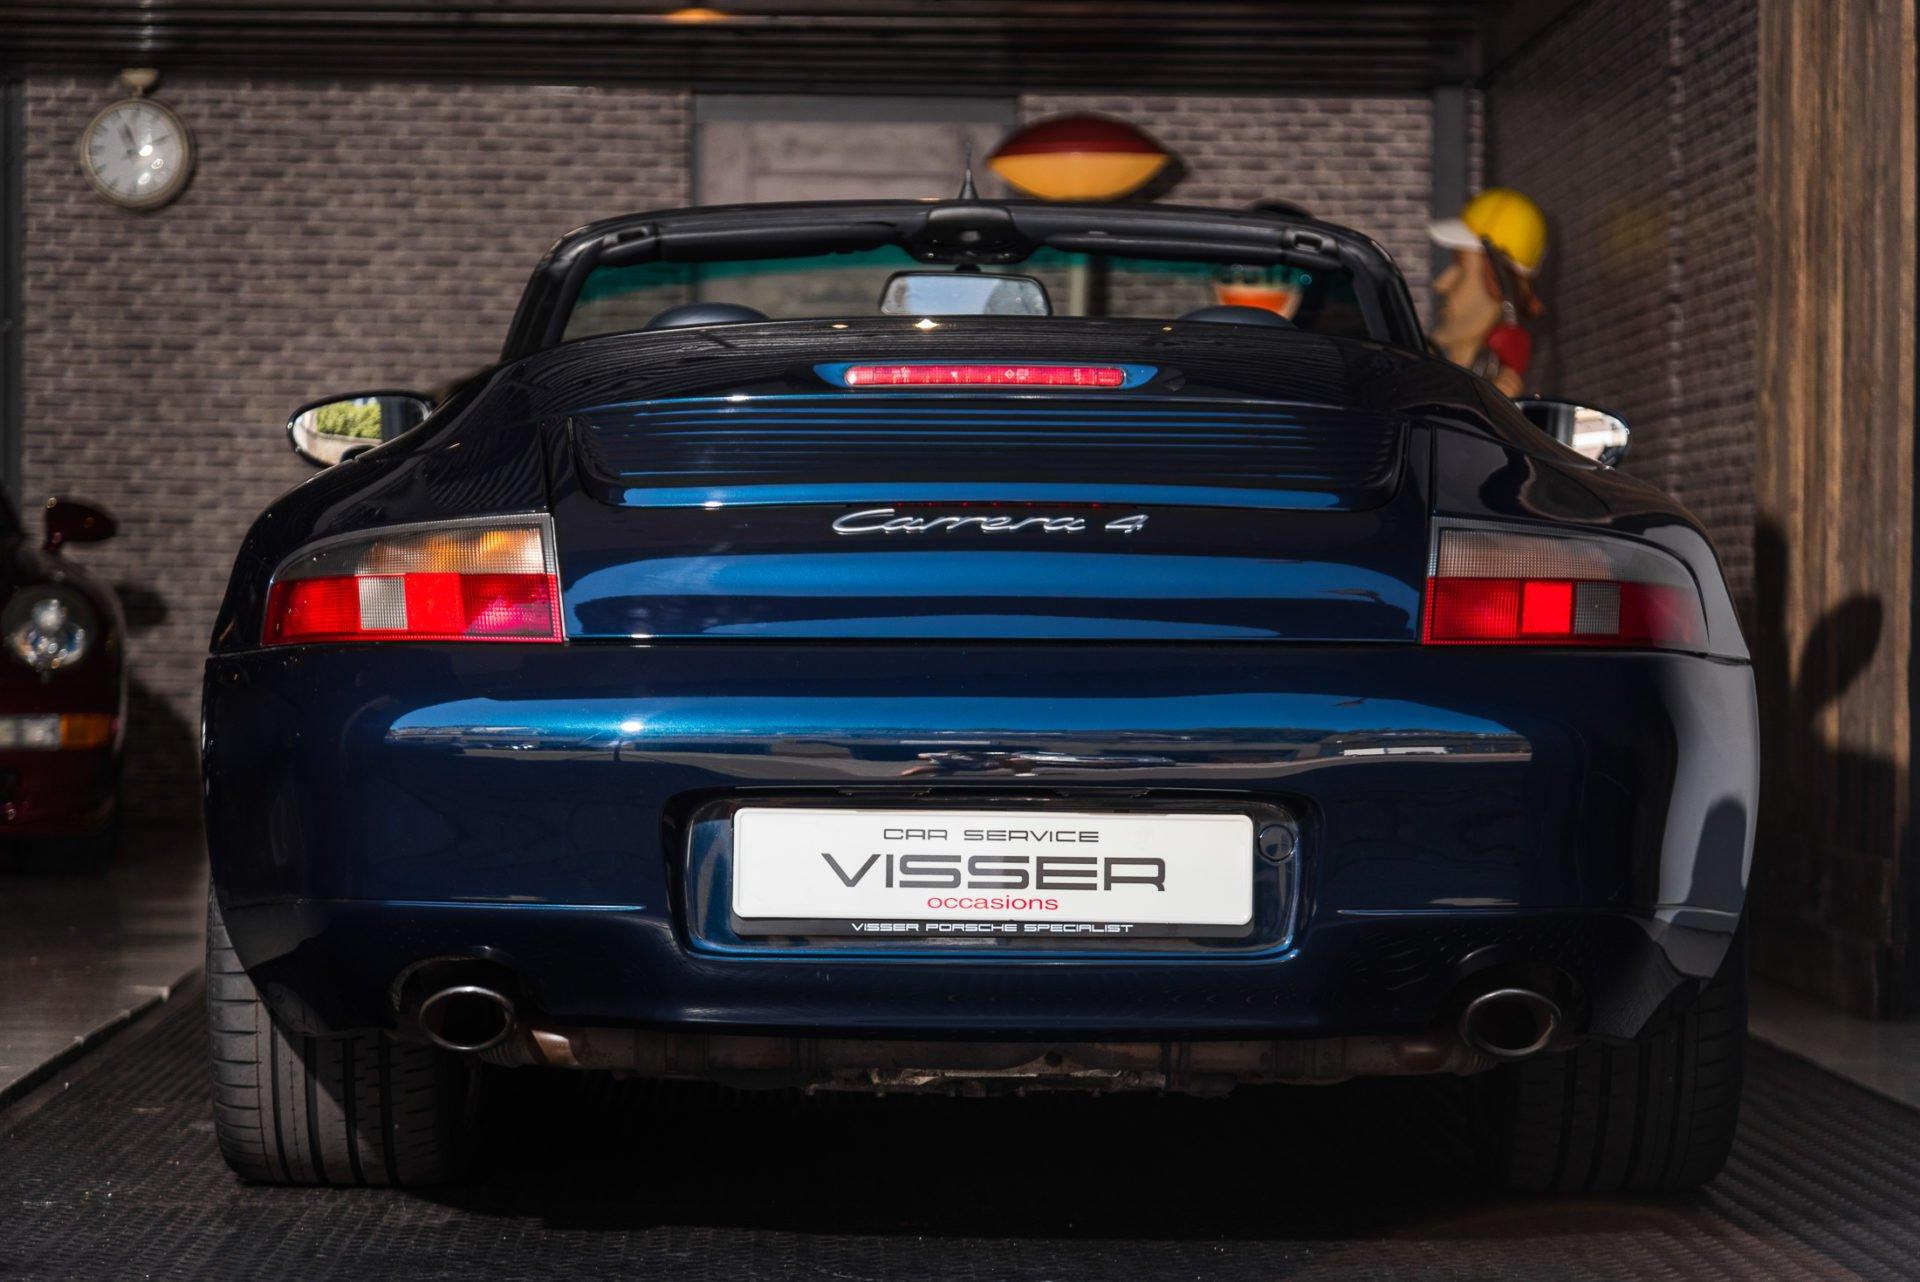 Porsche 996 Carrera 4 Cabrio -3